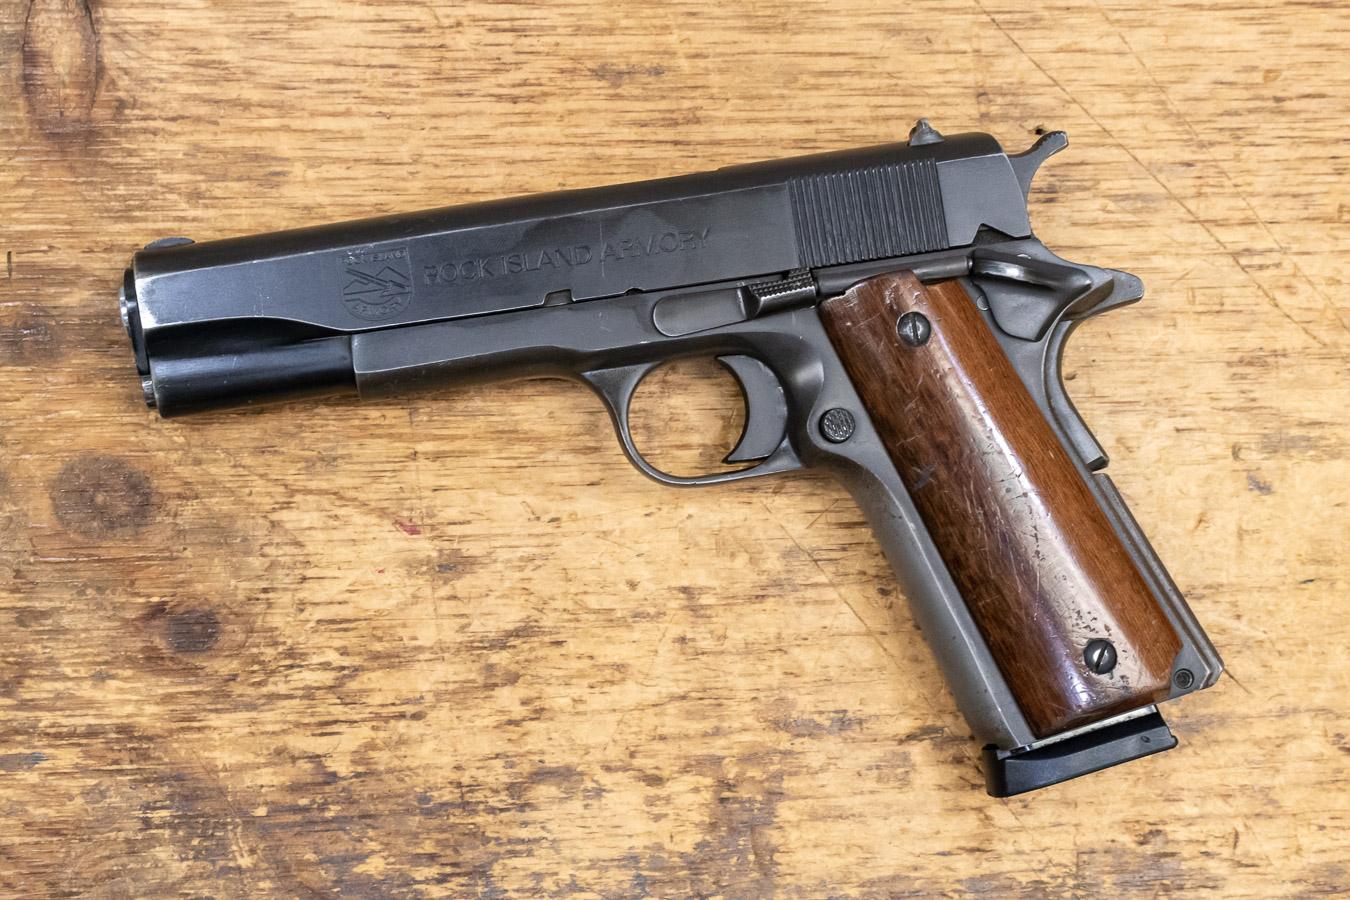 M1911 Full-Size 45 ACP Used Pistol